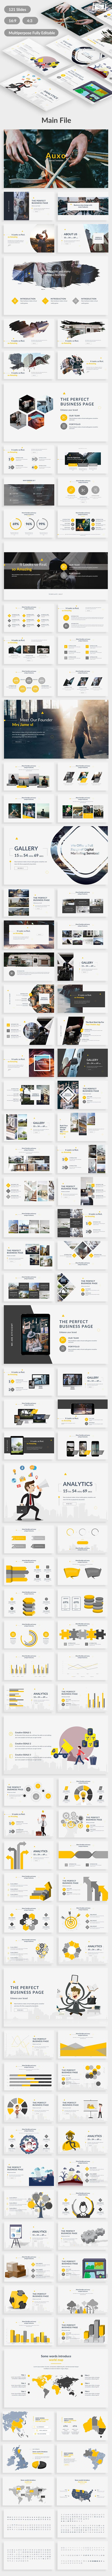 GraphicRiver Auxo Premium Multipurpose Google Slide Template 20477698